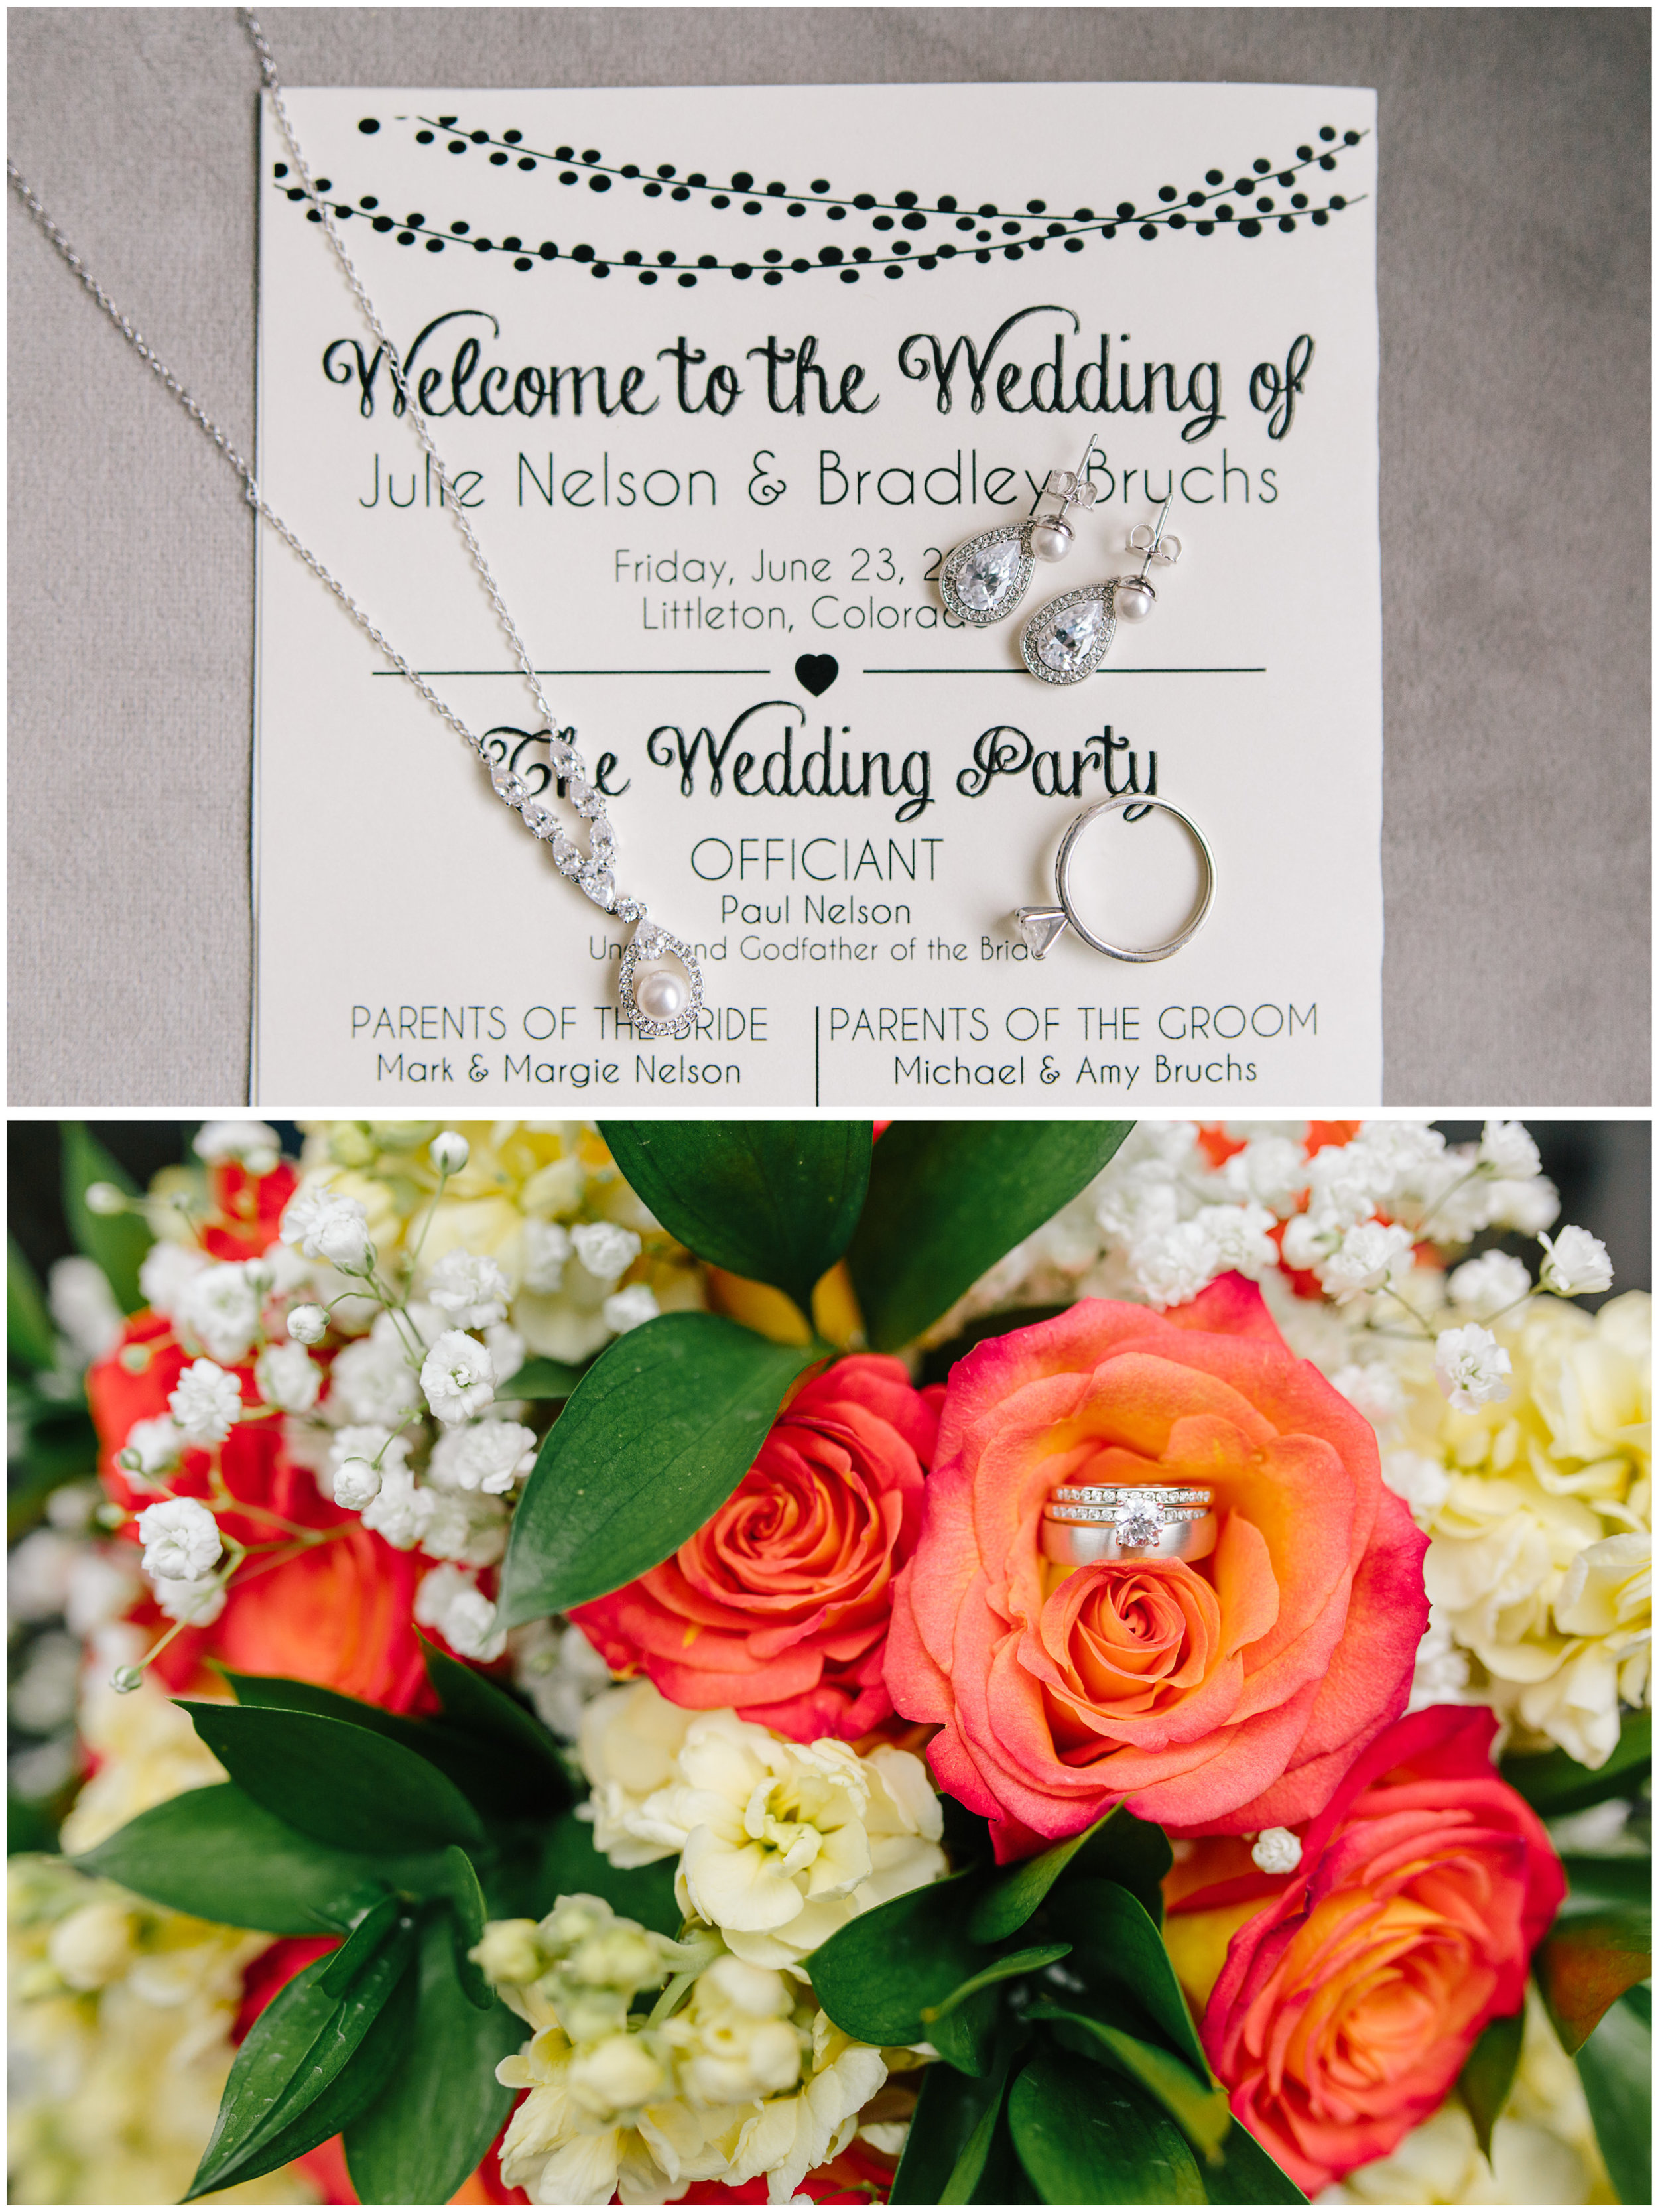 littleton_wedding_2.jpg